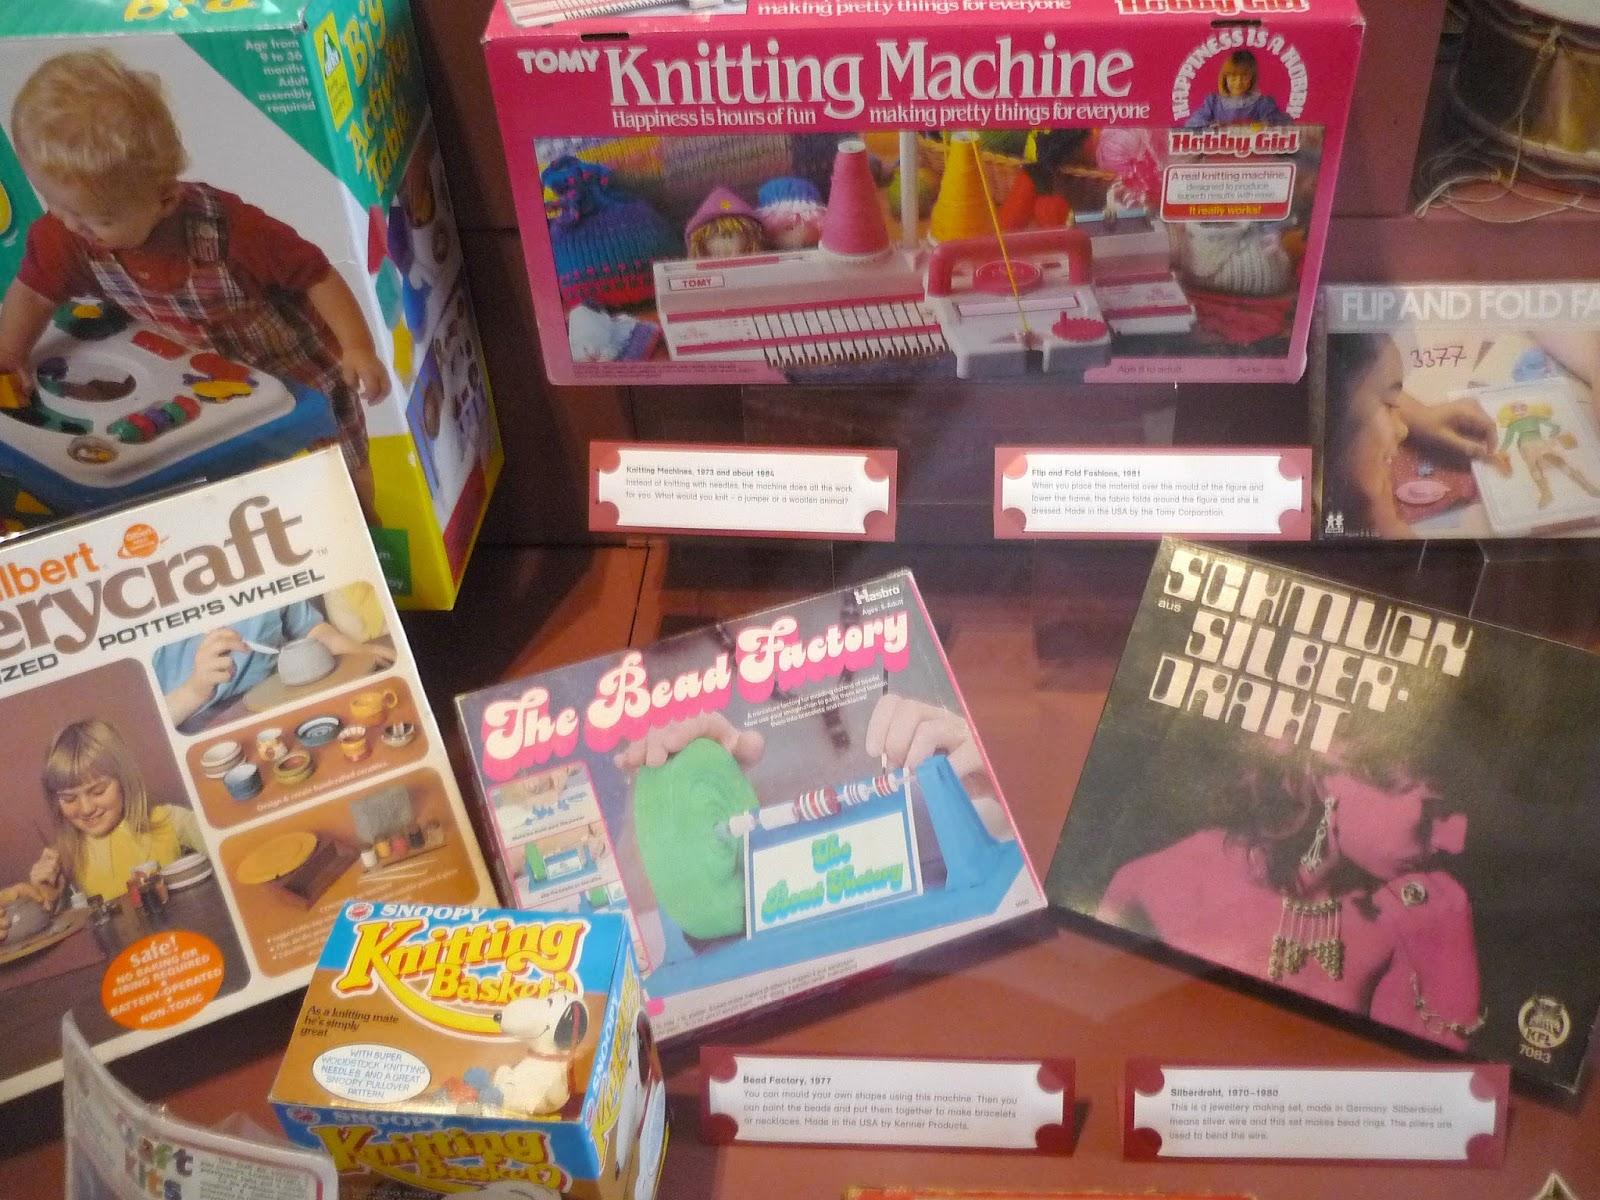 Knitting Nancy Machine : Fizzi jayne makes